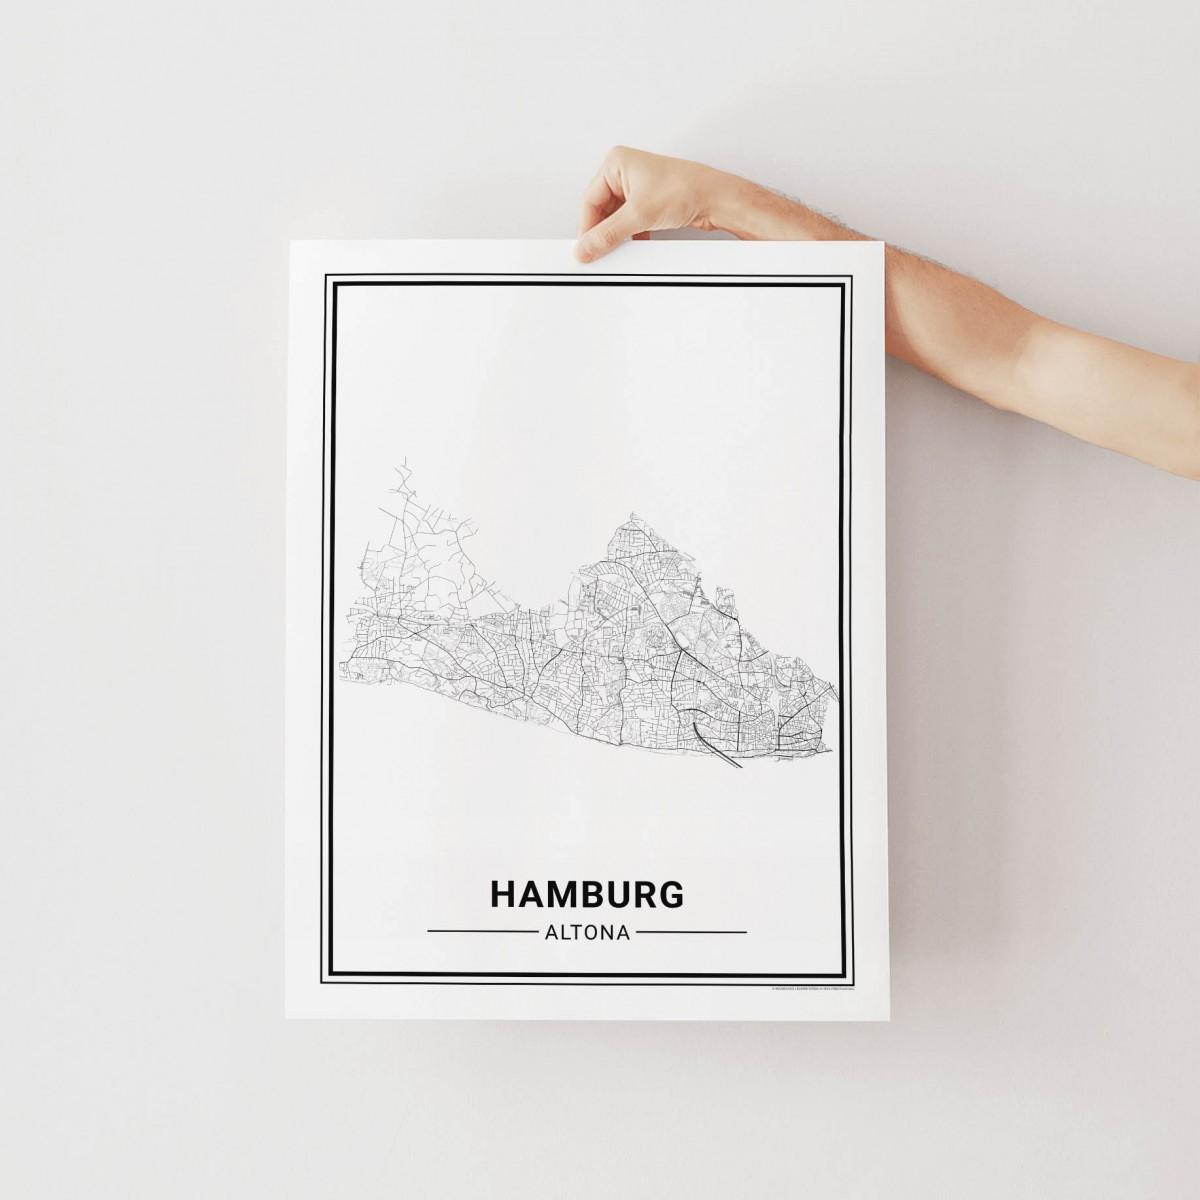 HAMBURG Altona Poster Stadtplan von Skanemarie